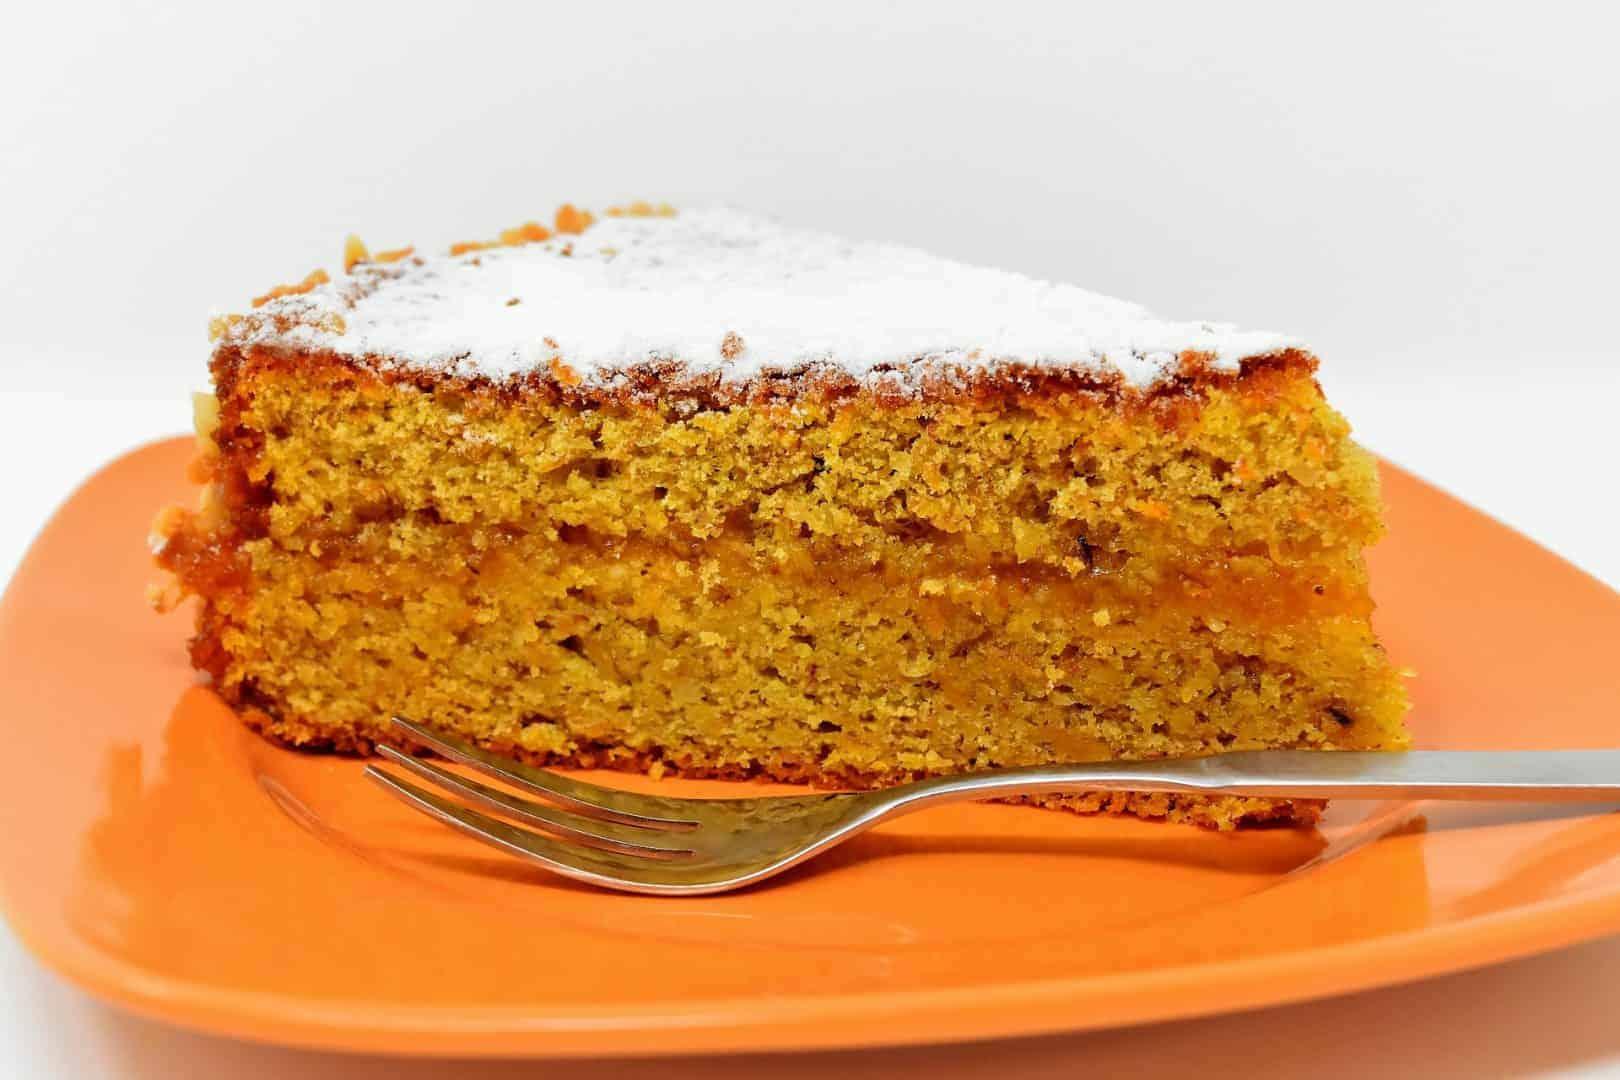 Dharamshala carrot cake